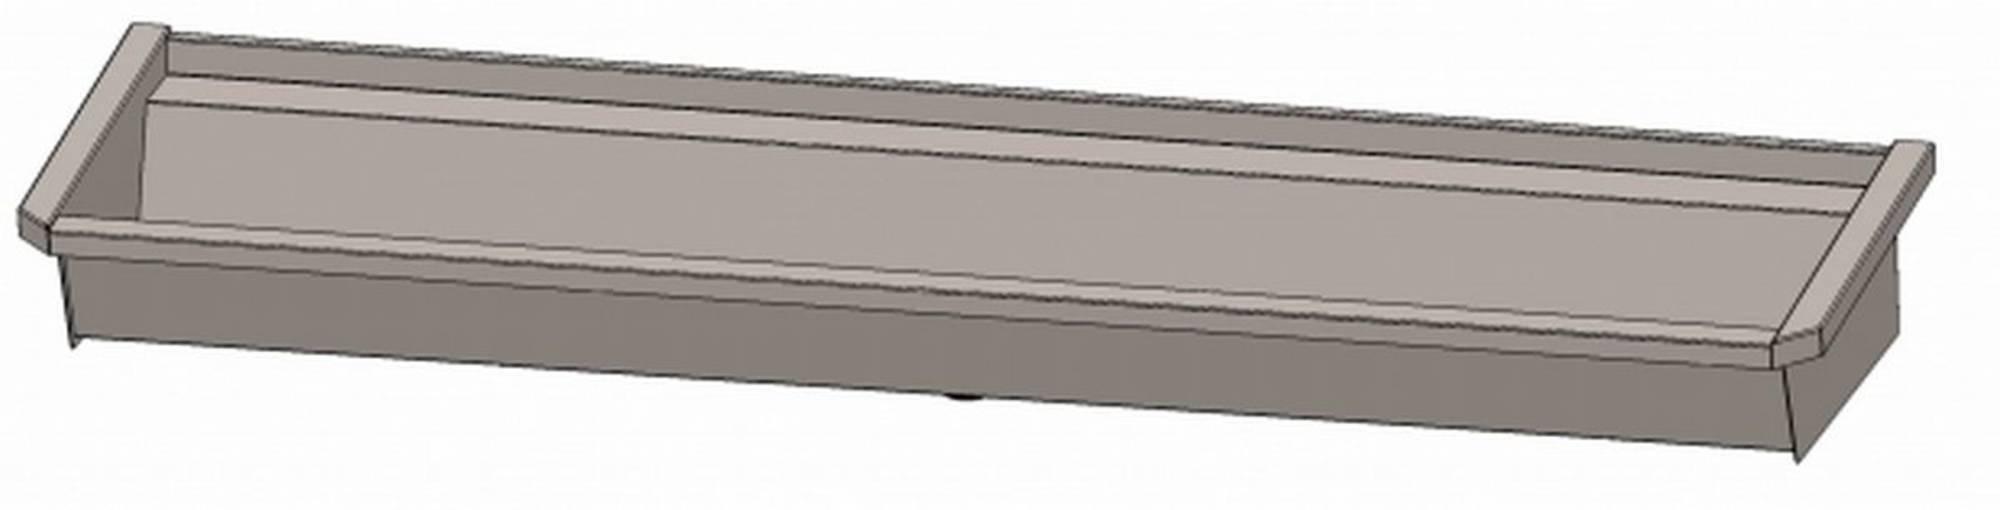 INTERSAN SANILAV wasgoot 180 cm. zonder leidingen zonder kranen INOX 304 (503Z1)